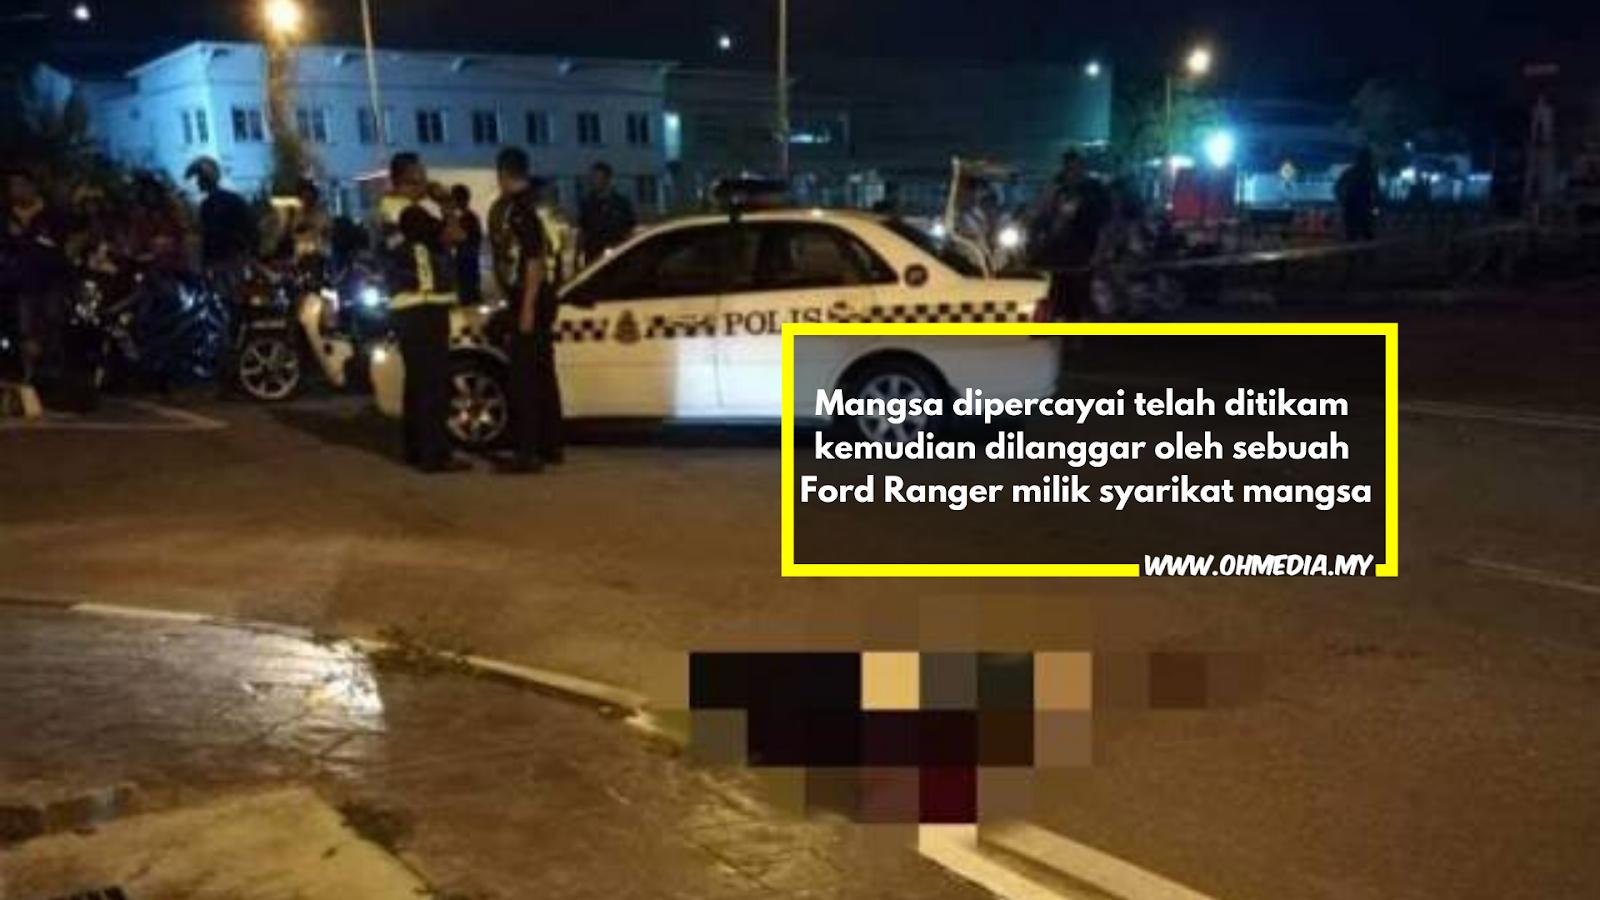 Lelaki ditikam dan dilanggar sampai mati oh media for Mohd shop